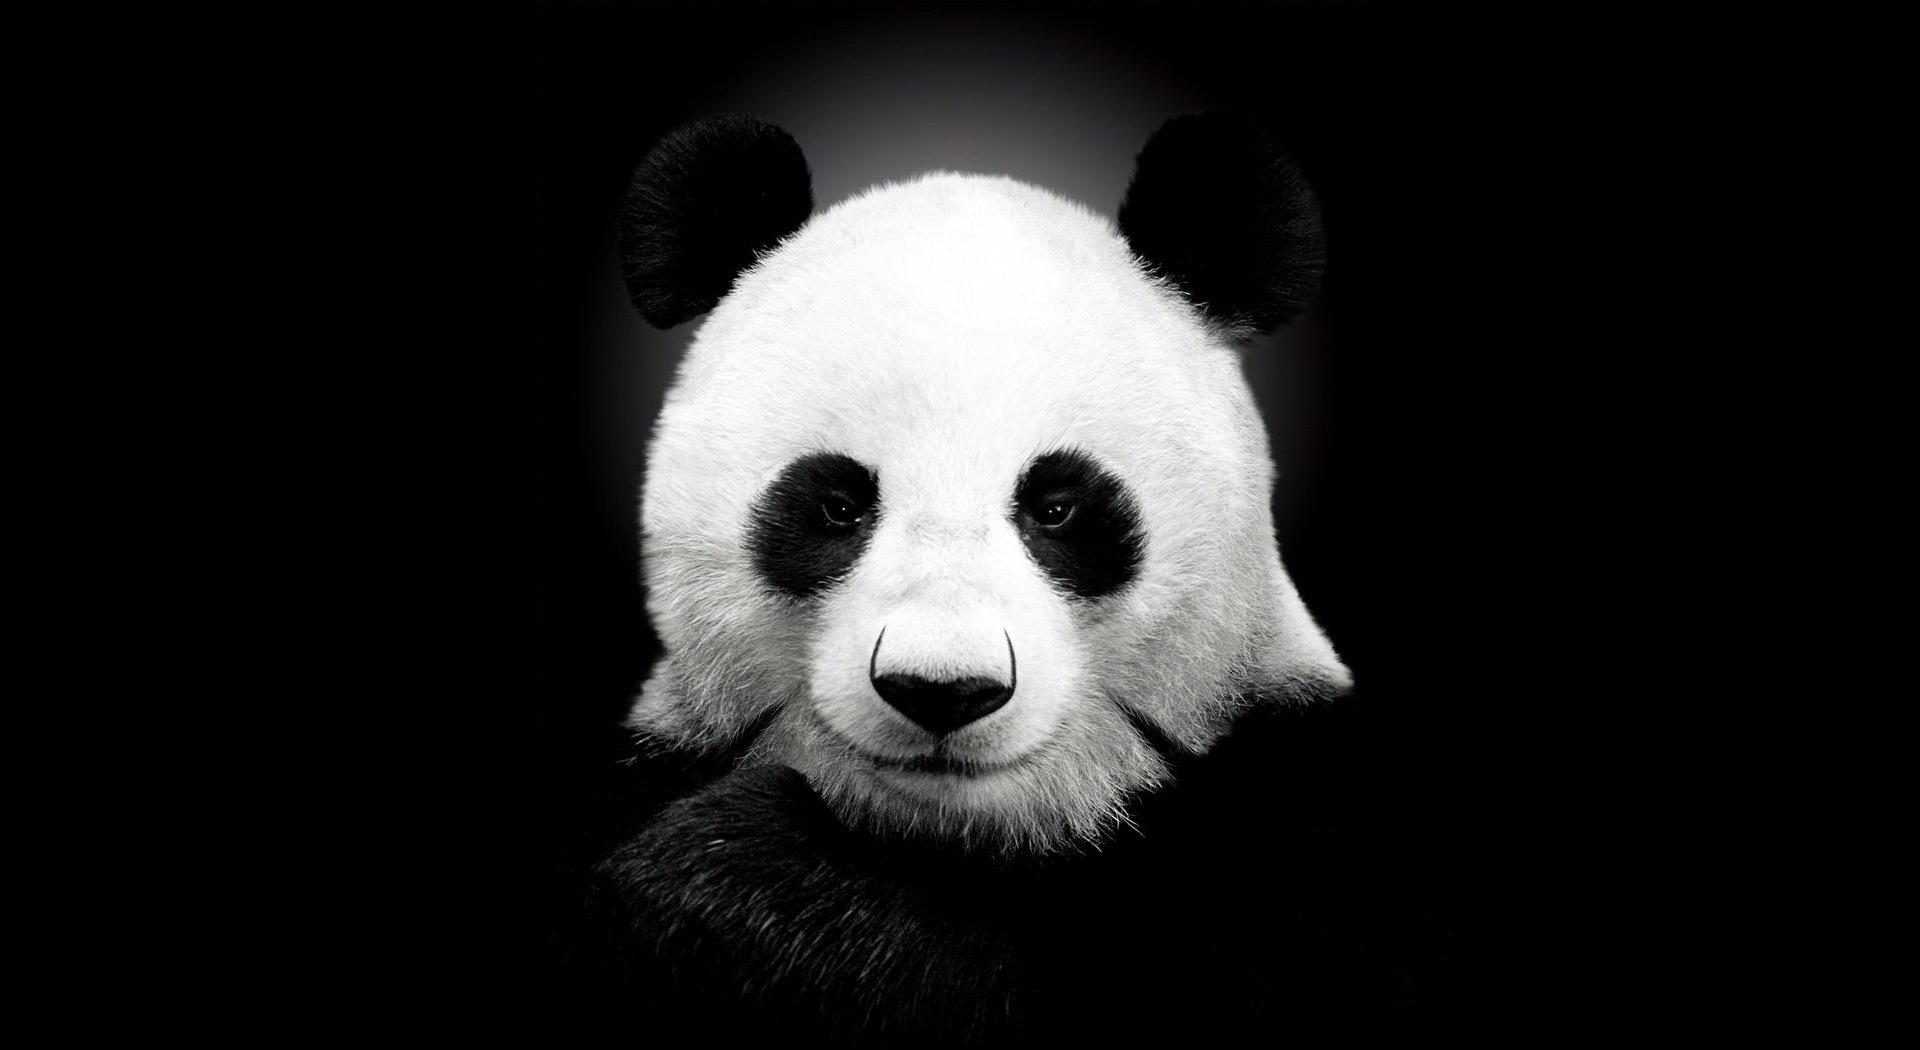 Download mobile wallpaper Pandas, Animals for free.